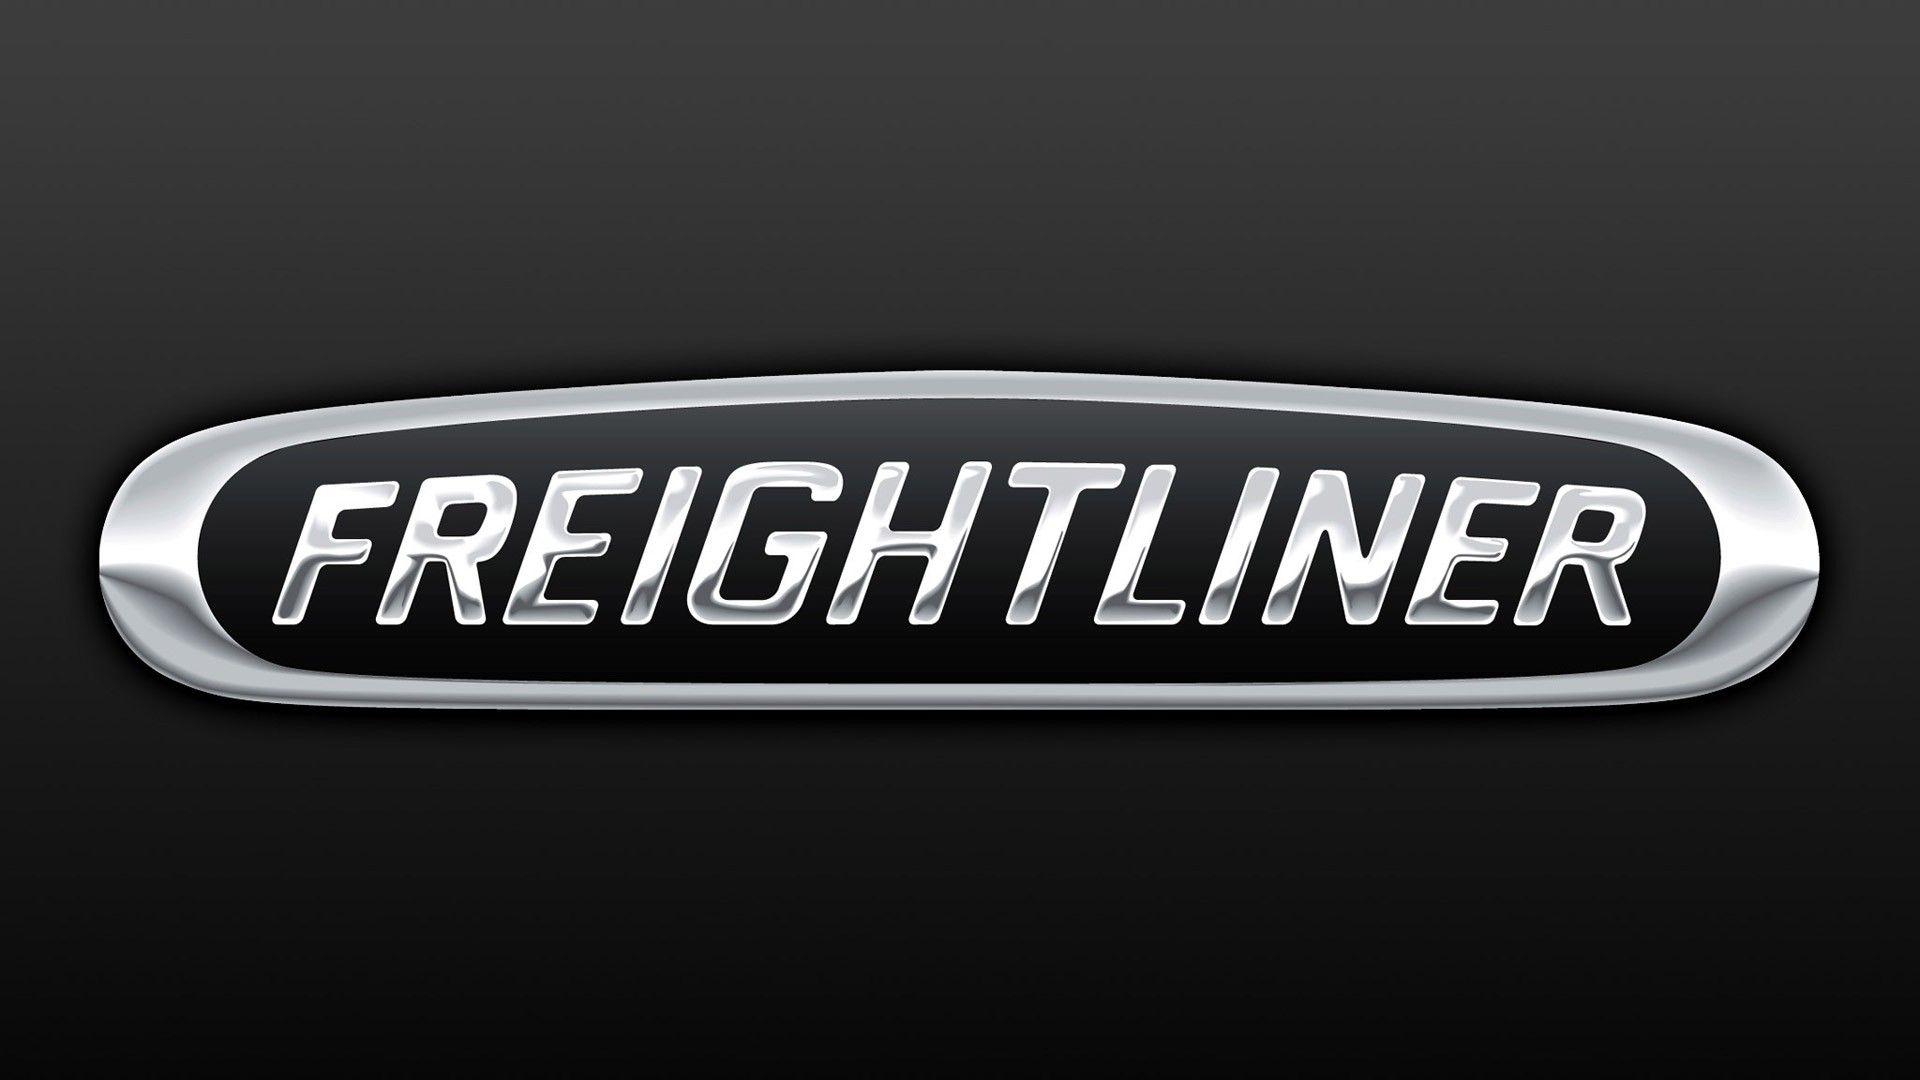 Freightliner Wallpapers Hd Download In 2021 Freightliner Wallpaper Pc Wallpaper